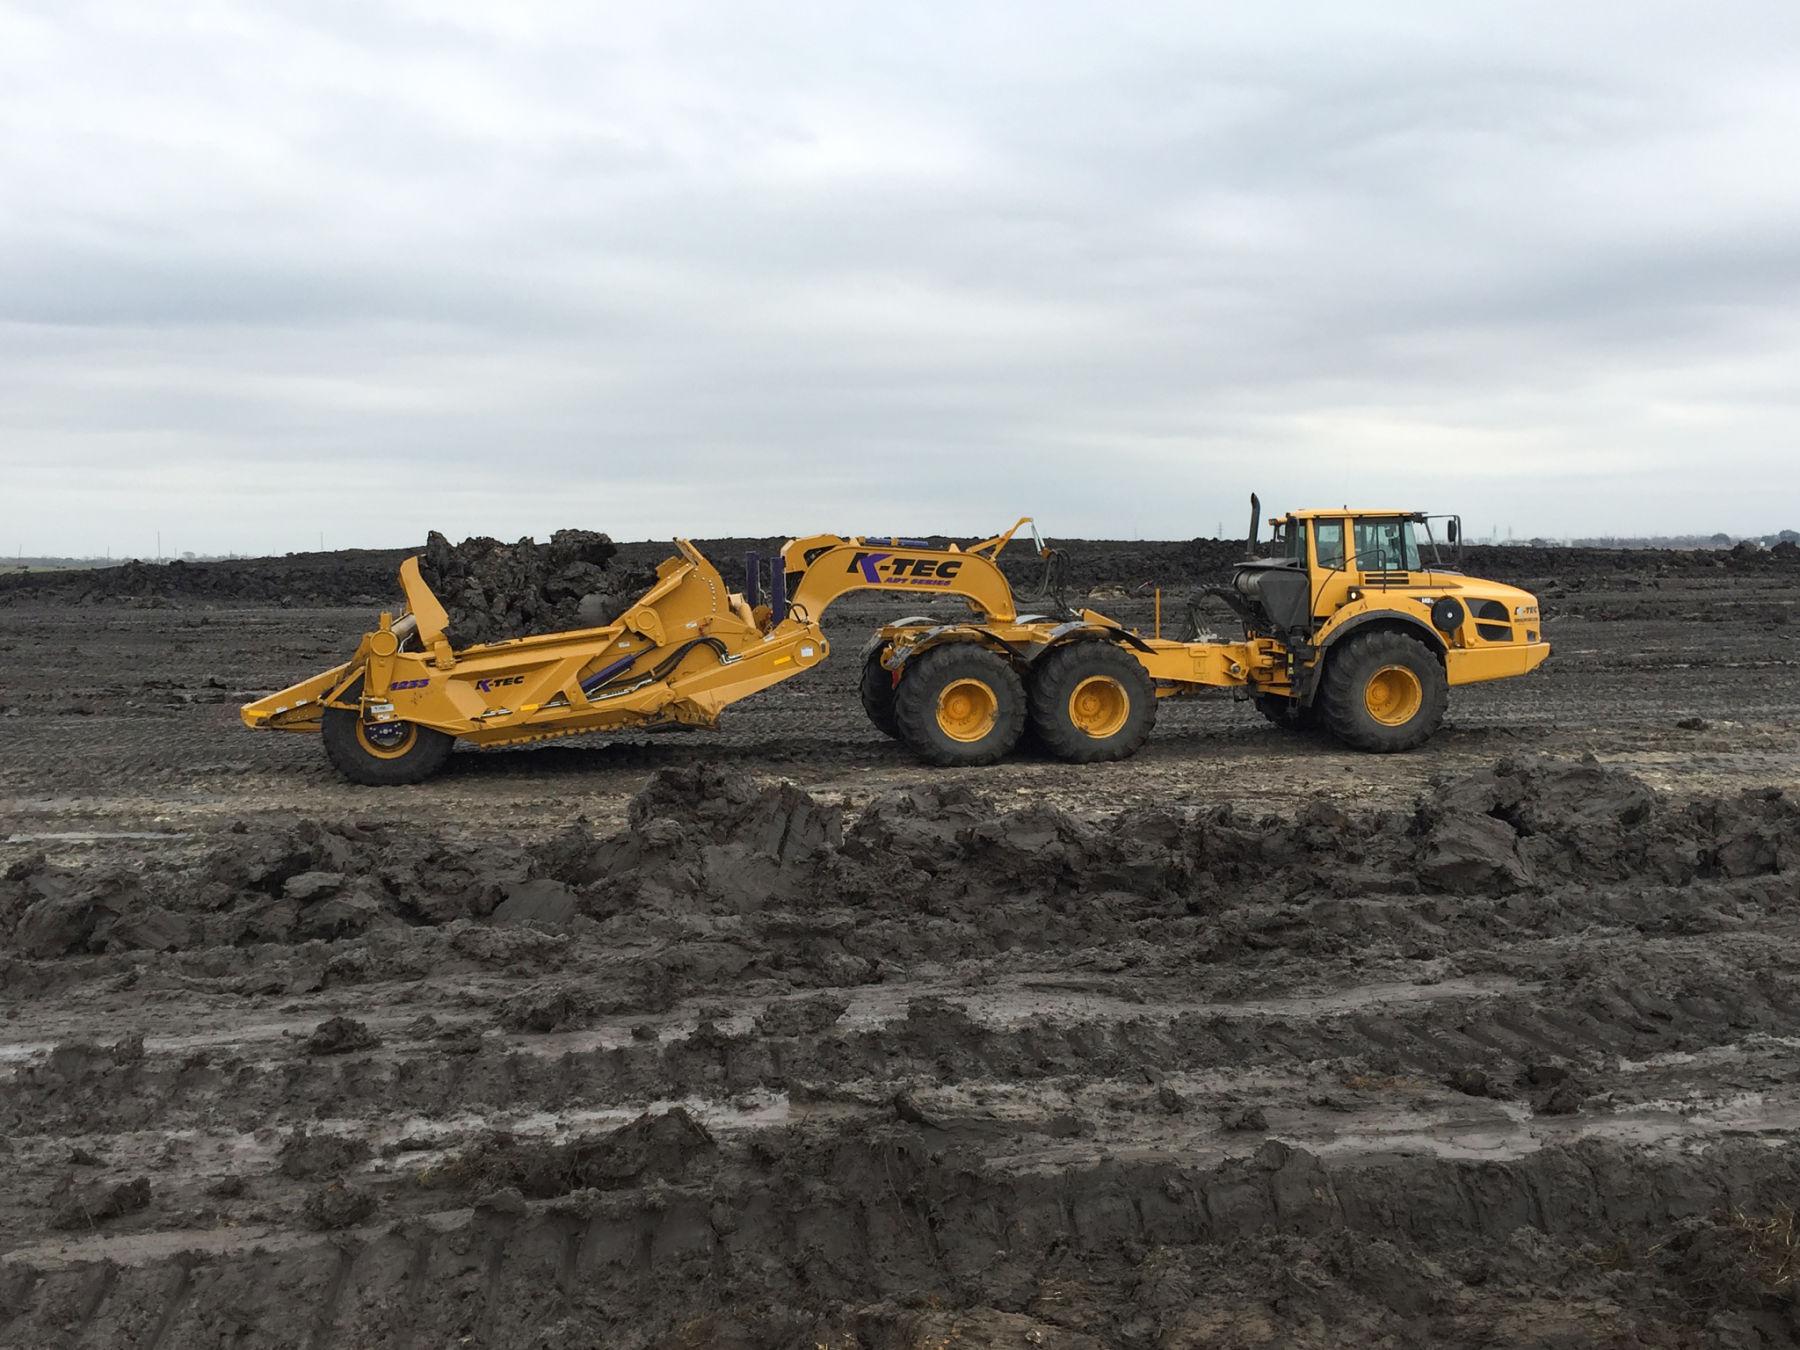 K-Tec 1233 ADT Loading Mud